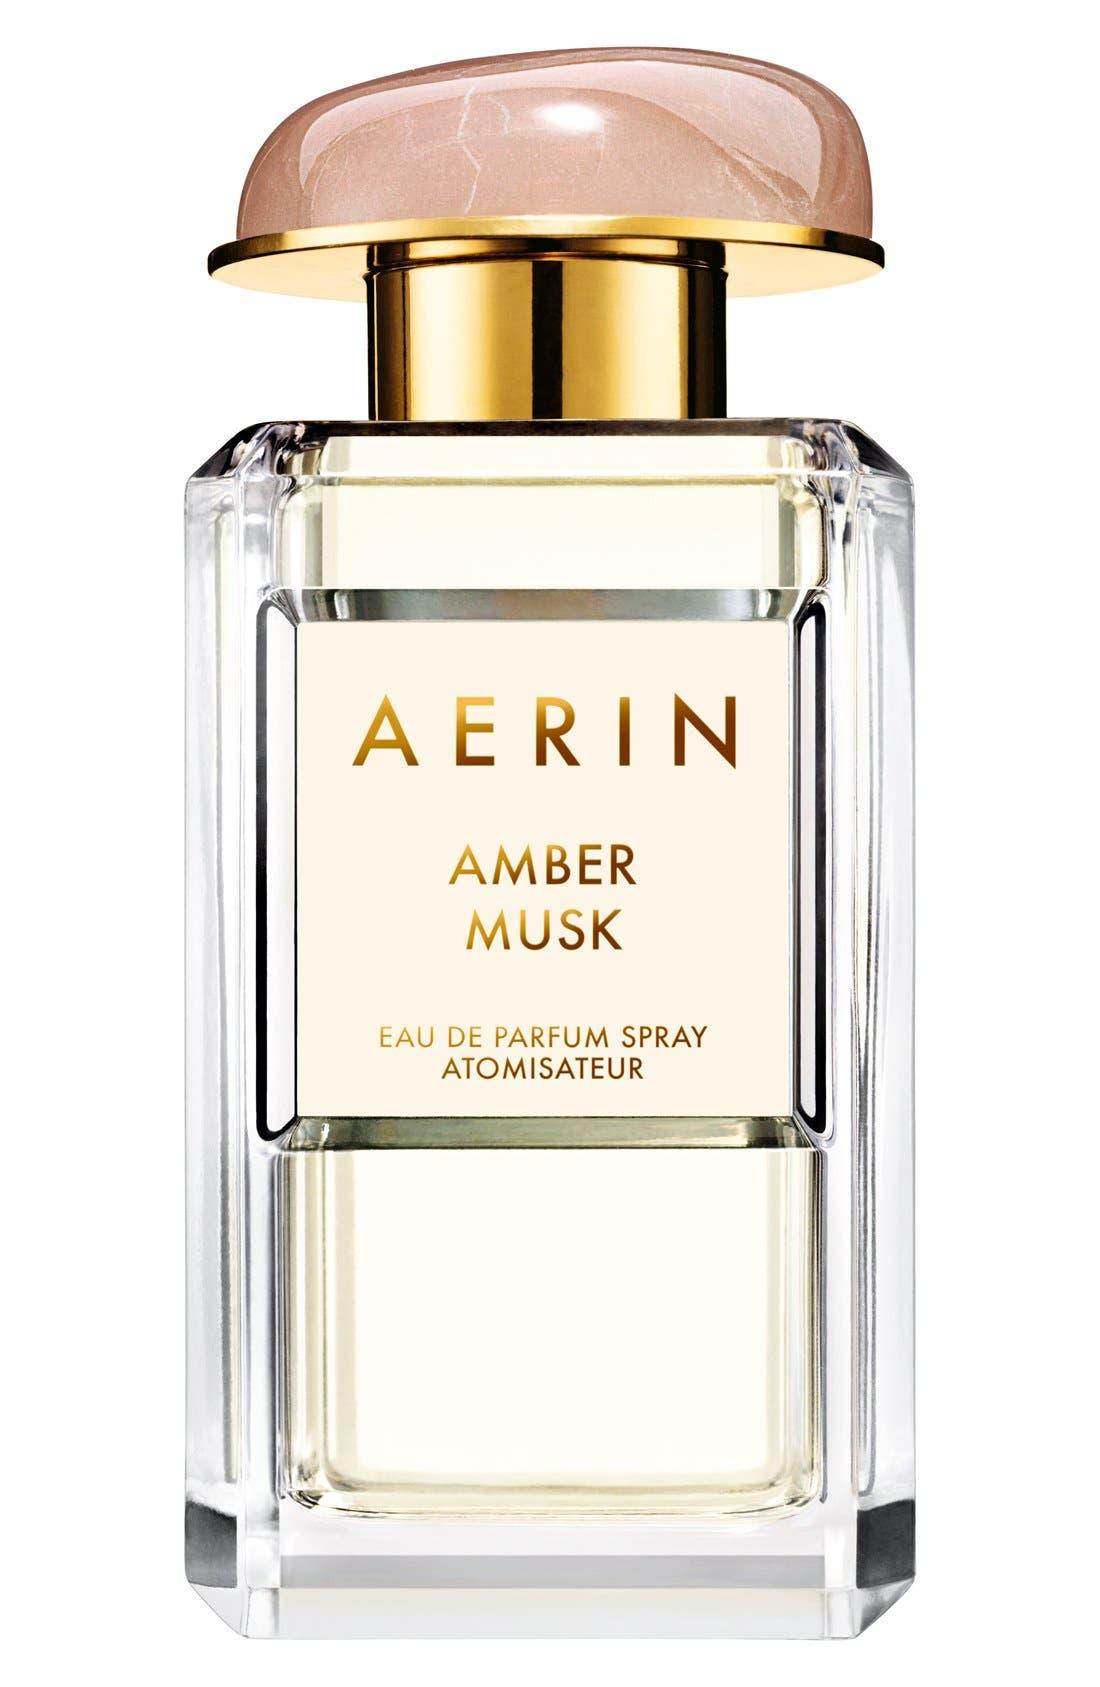 AERIN Beauty Amber Musk Eau de Parfum Spray,                             Main thumbnail 1, color,                             NO COLOR